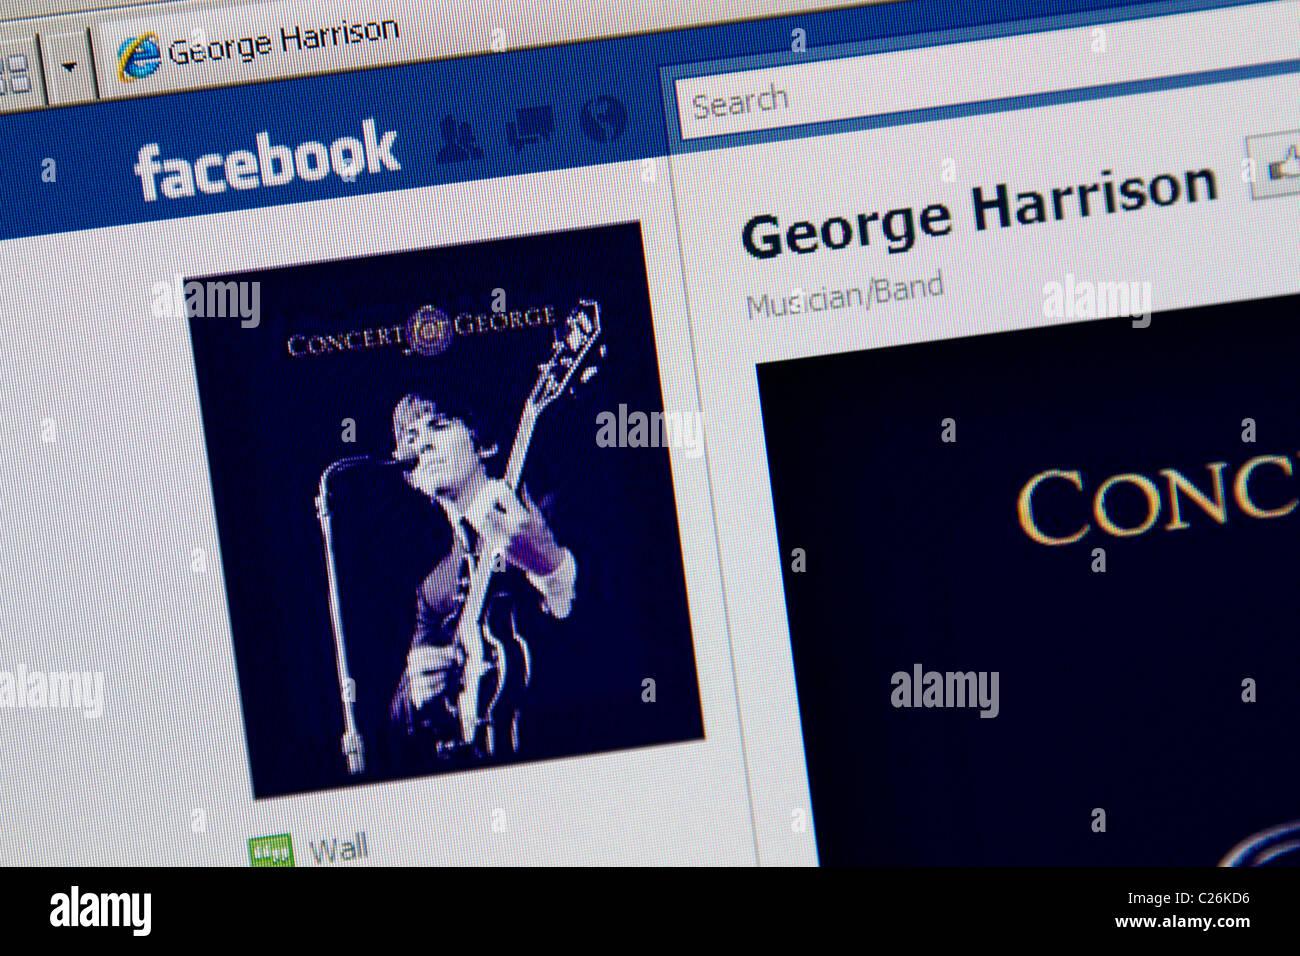 George Harrison online facebook fanpage - Stock Image